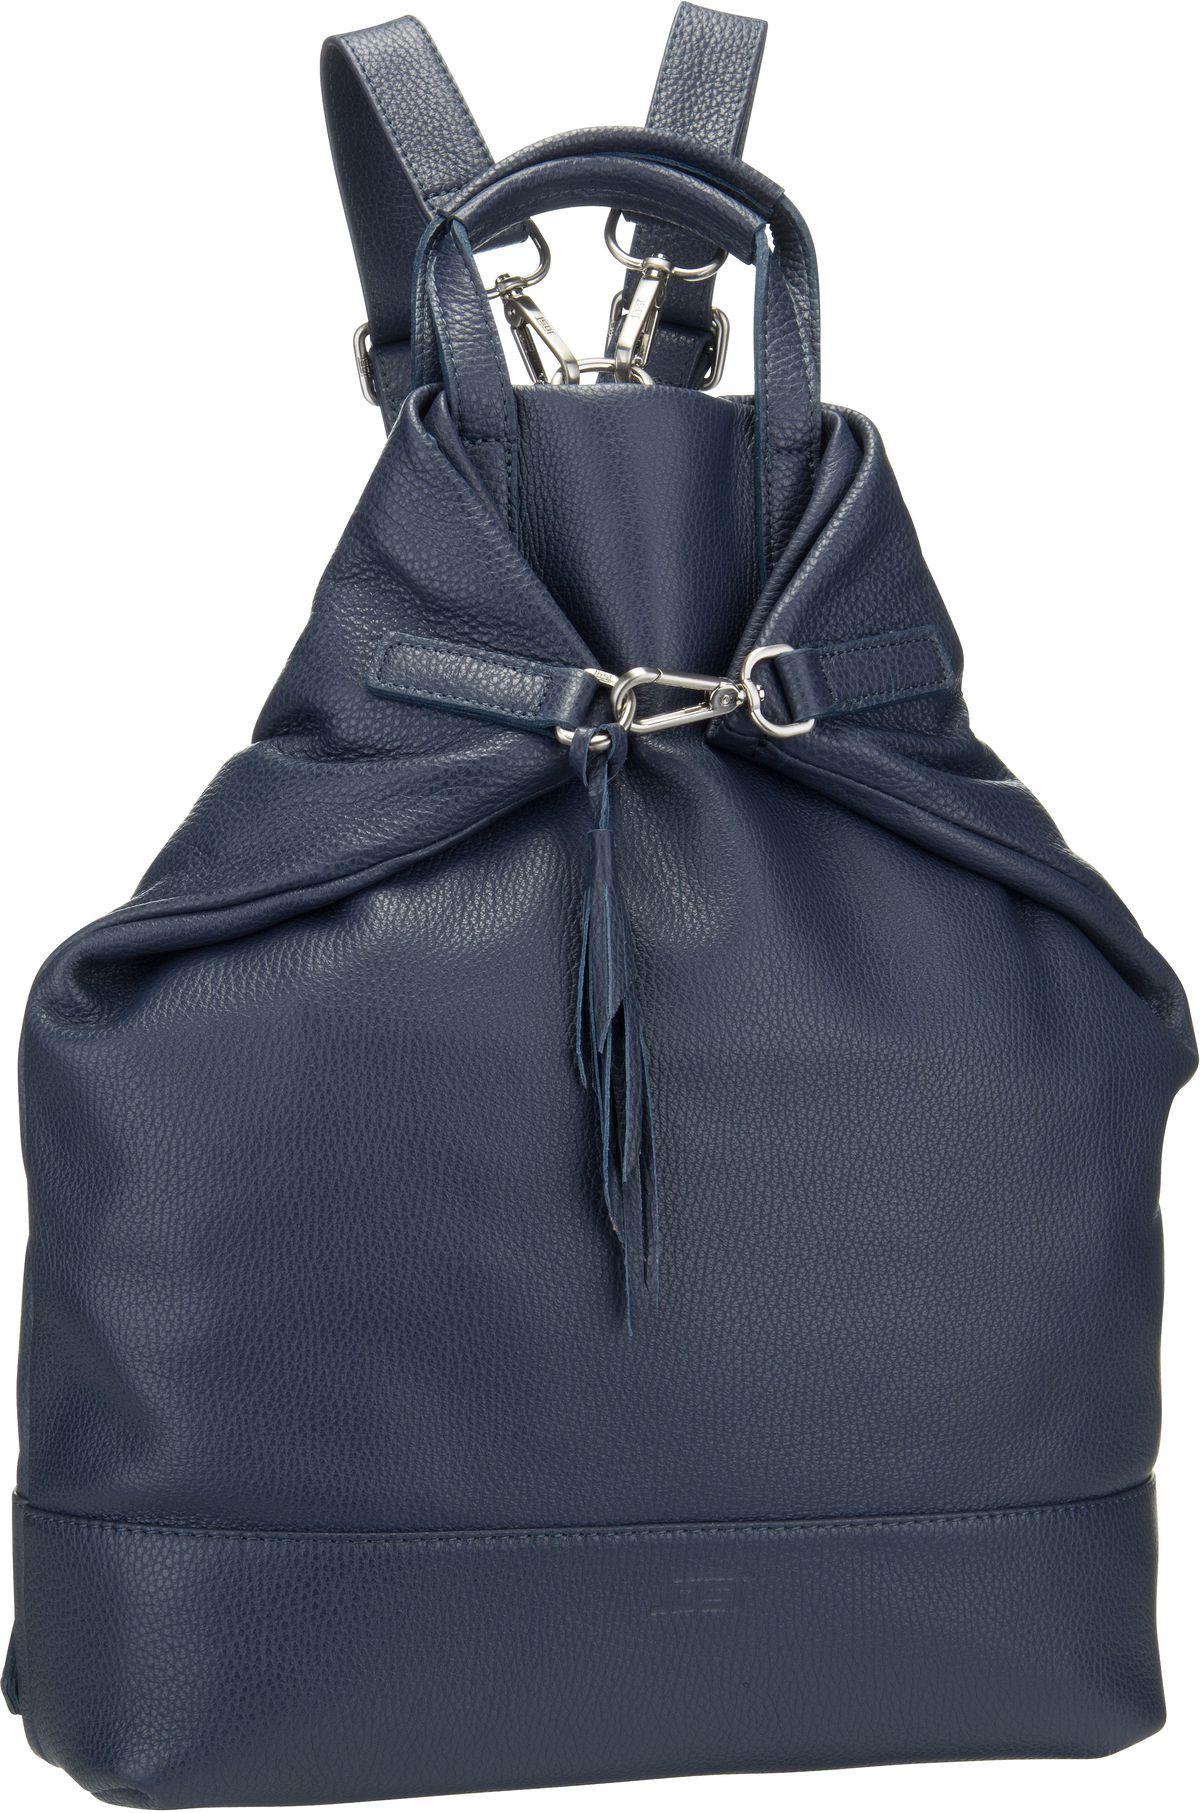 Rucksack / Daypack Vika 1839 X-Change Bag 3in1 M Navy